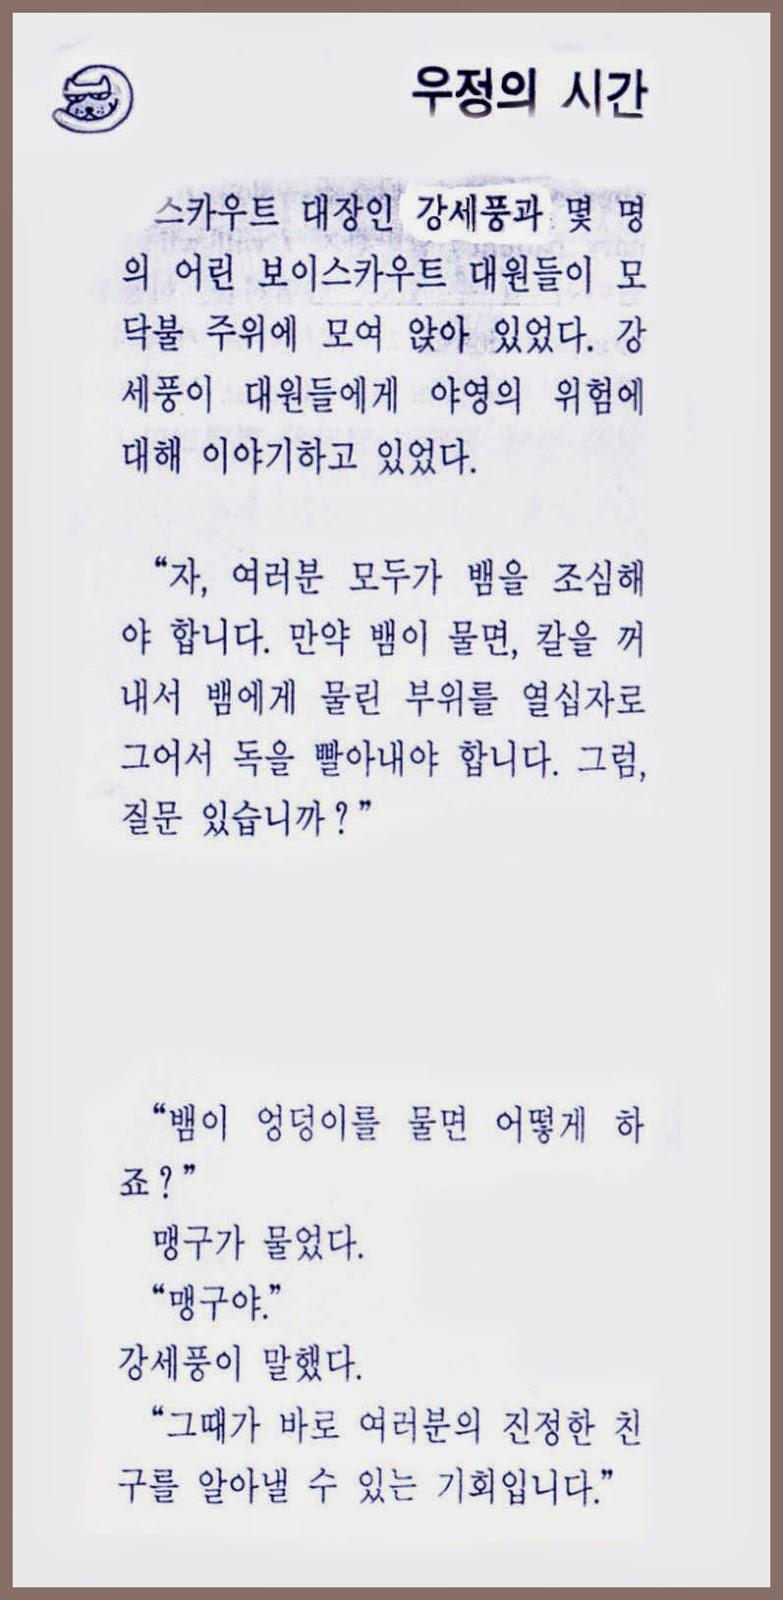 Kata Kata Persahabatan Dalam Bahasa Korea : persahabatan, dalam, bahasa, korea, USEFULLIFE, USEFULSHARING:, Humor, Korea, (Waktu, Persahabatan)